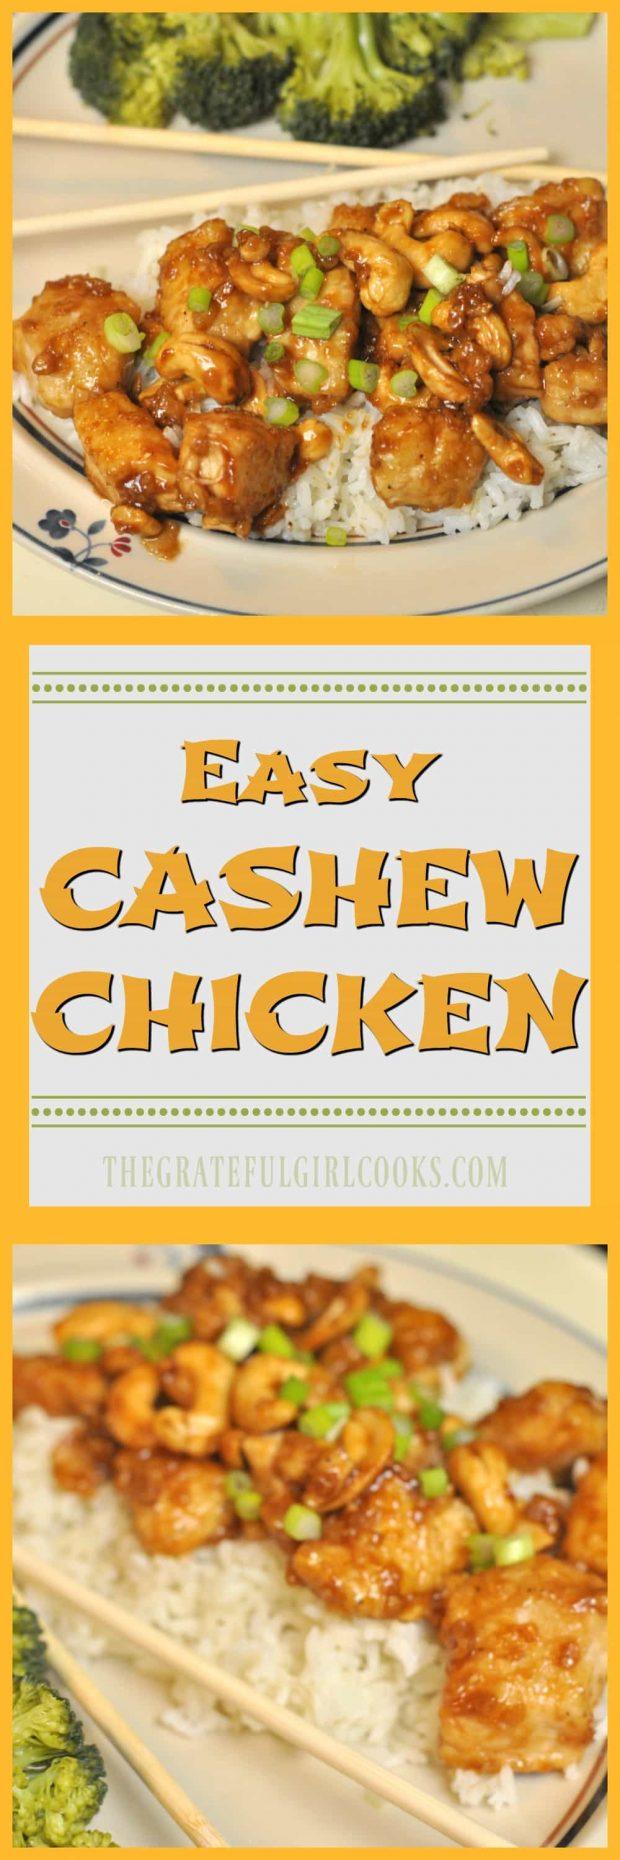 Easy Cashew Chicken / The Grateful Girl Cooks!